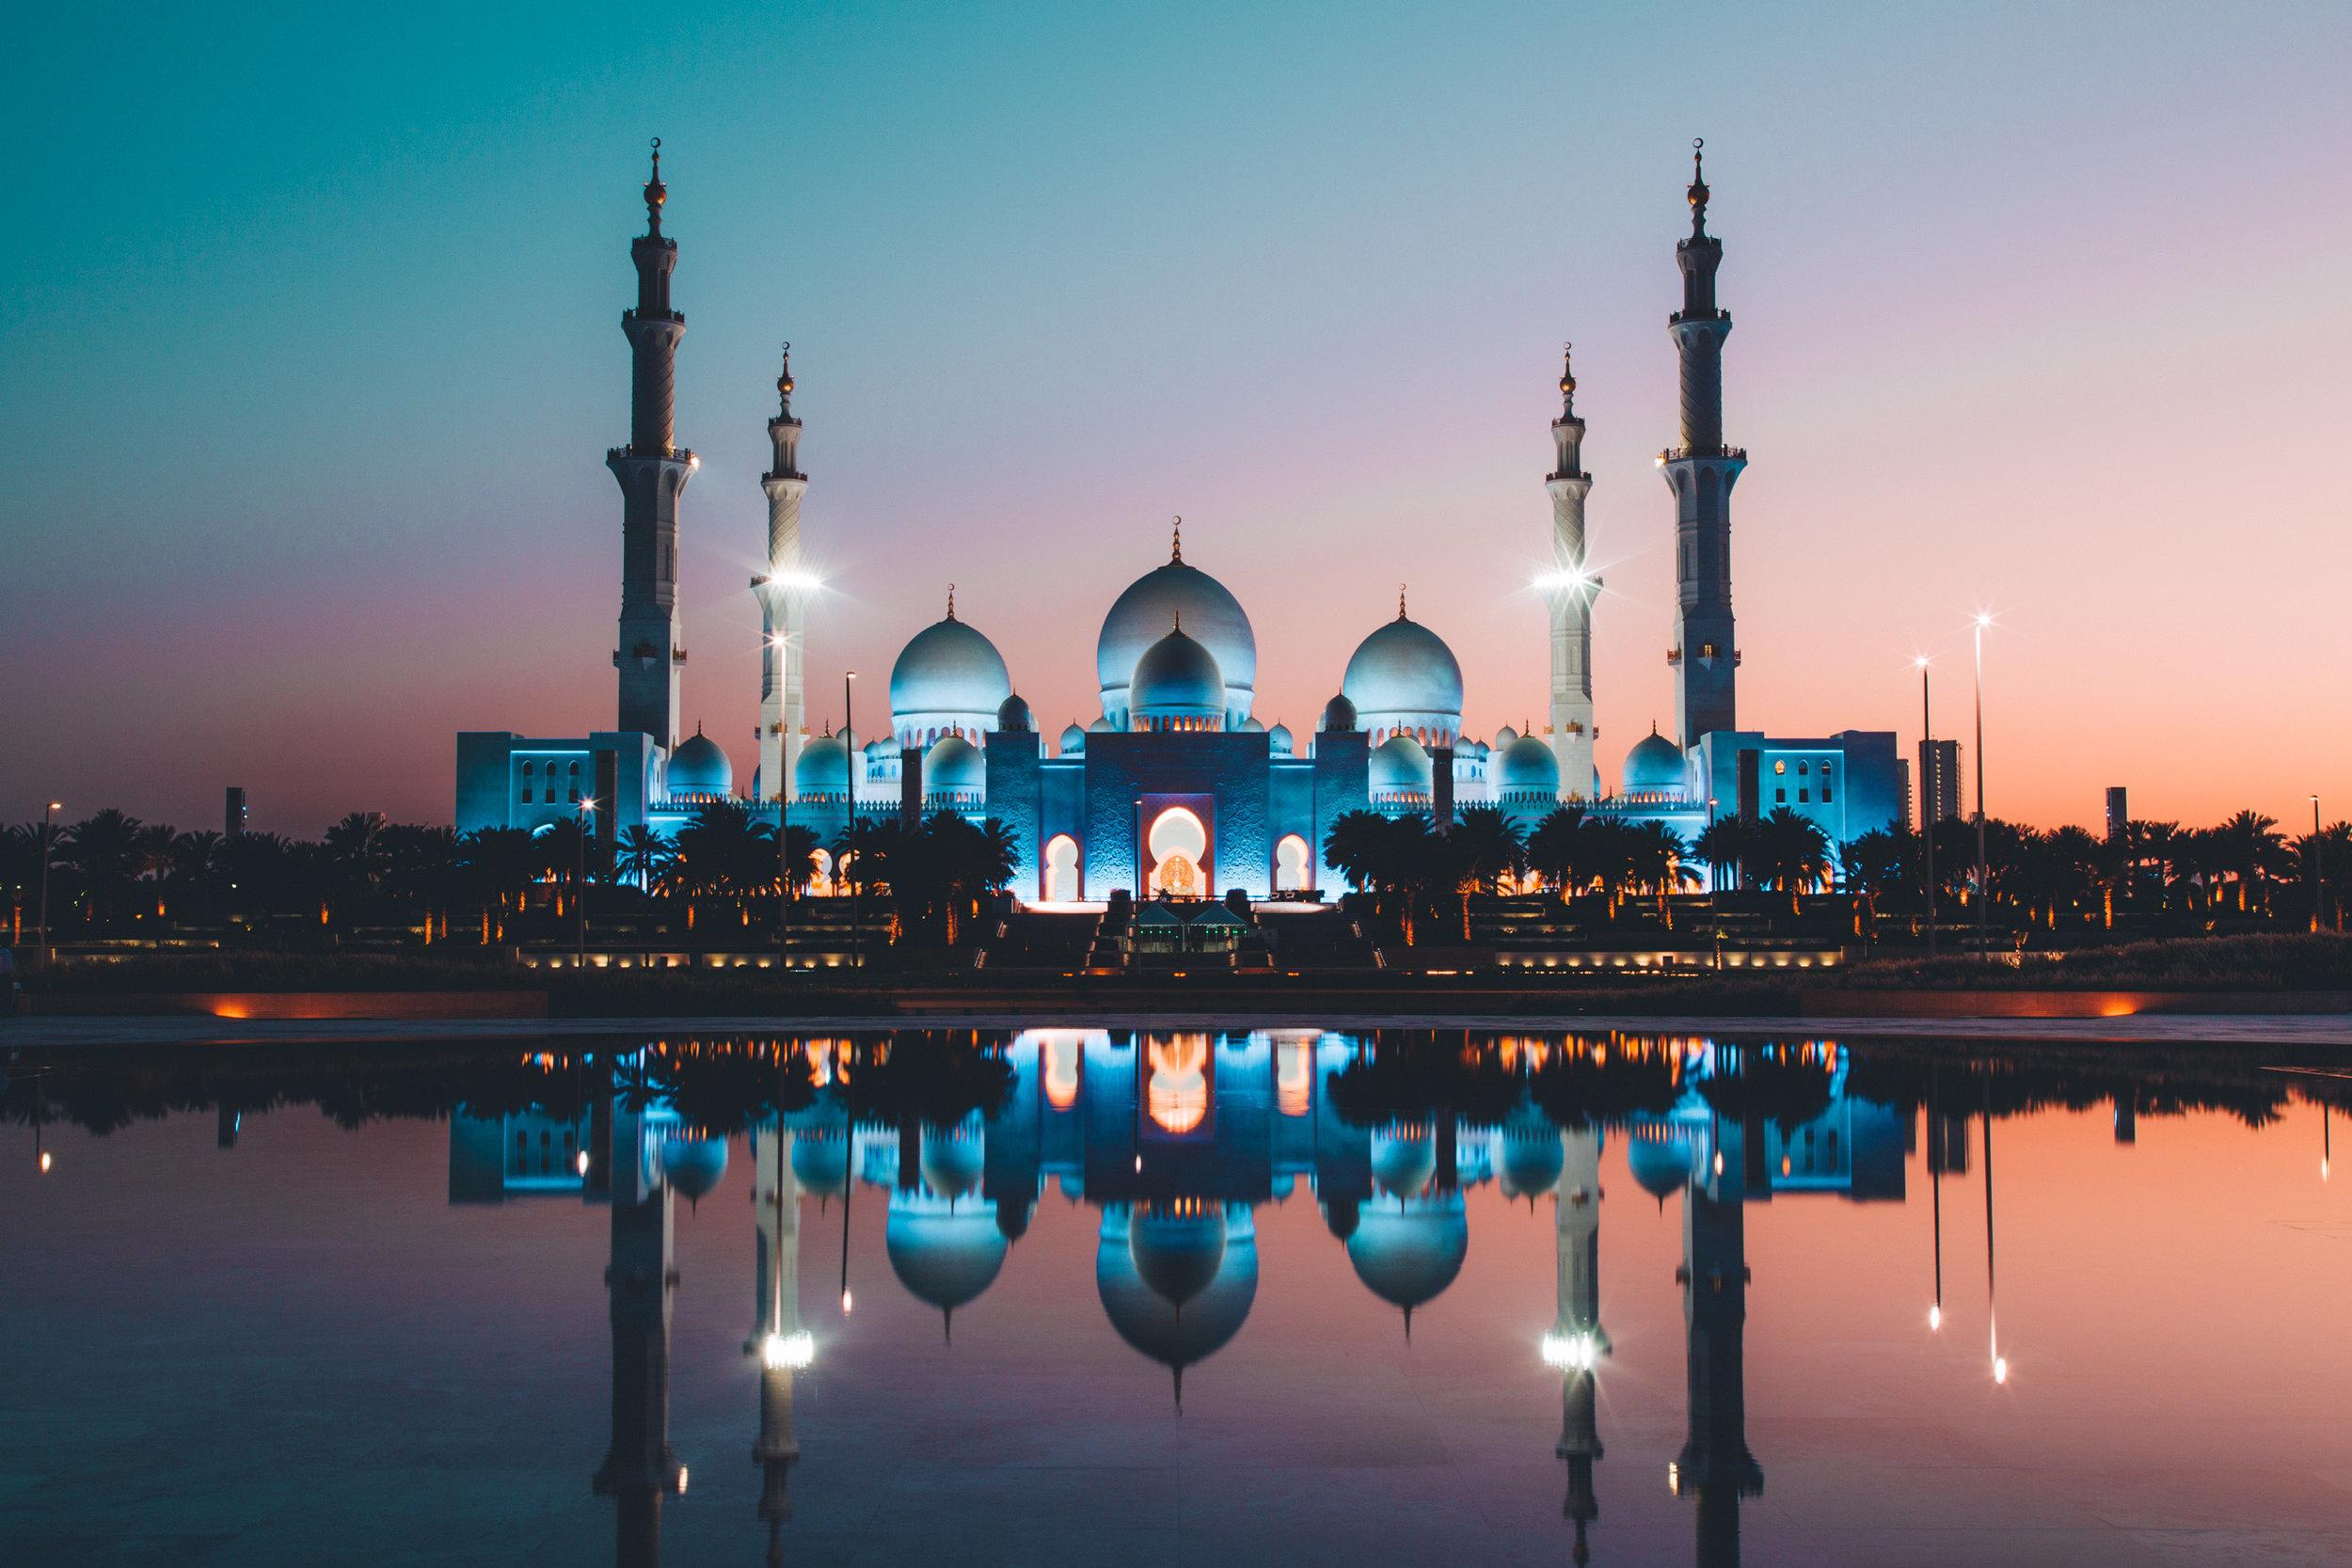 The Sheikh Zayed Grand Mosque in Abu Dhabi (Photo: David Rodrigo,  Unsplash )